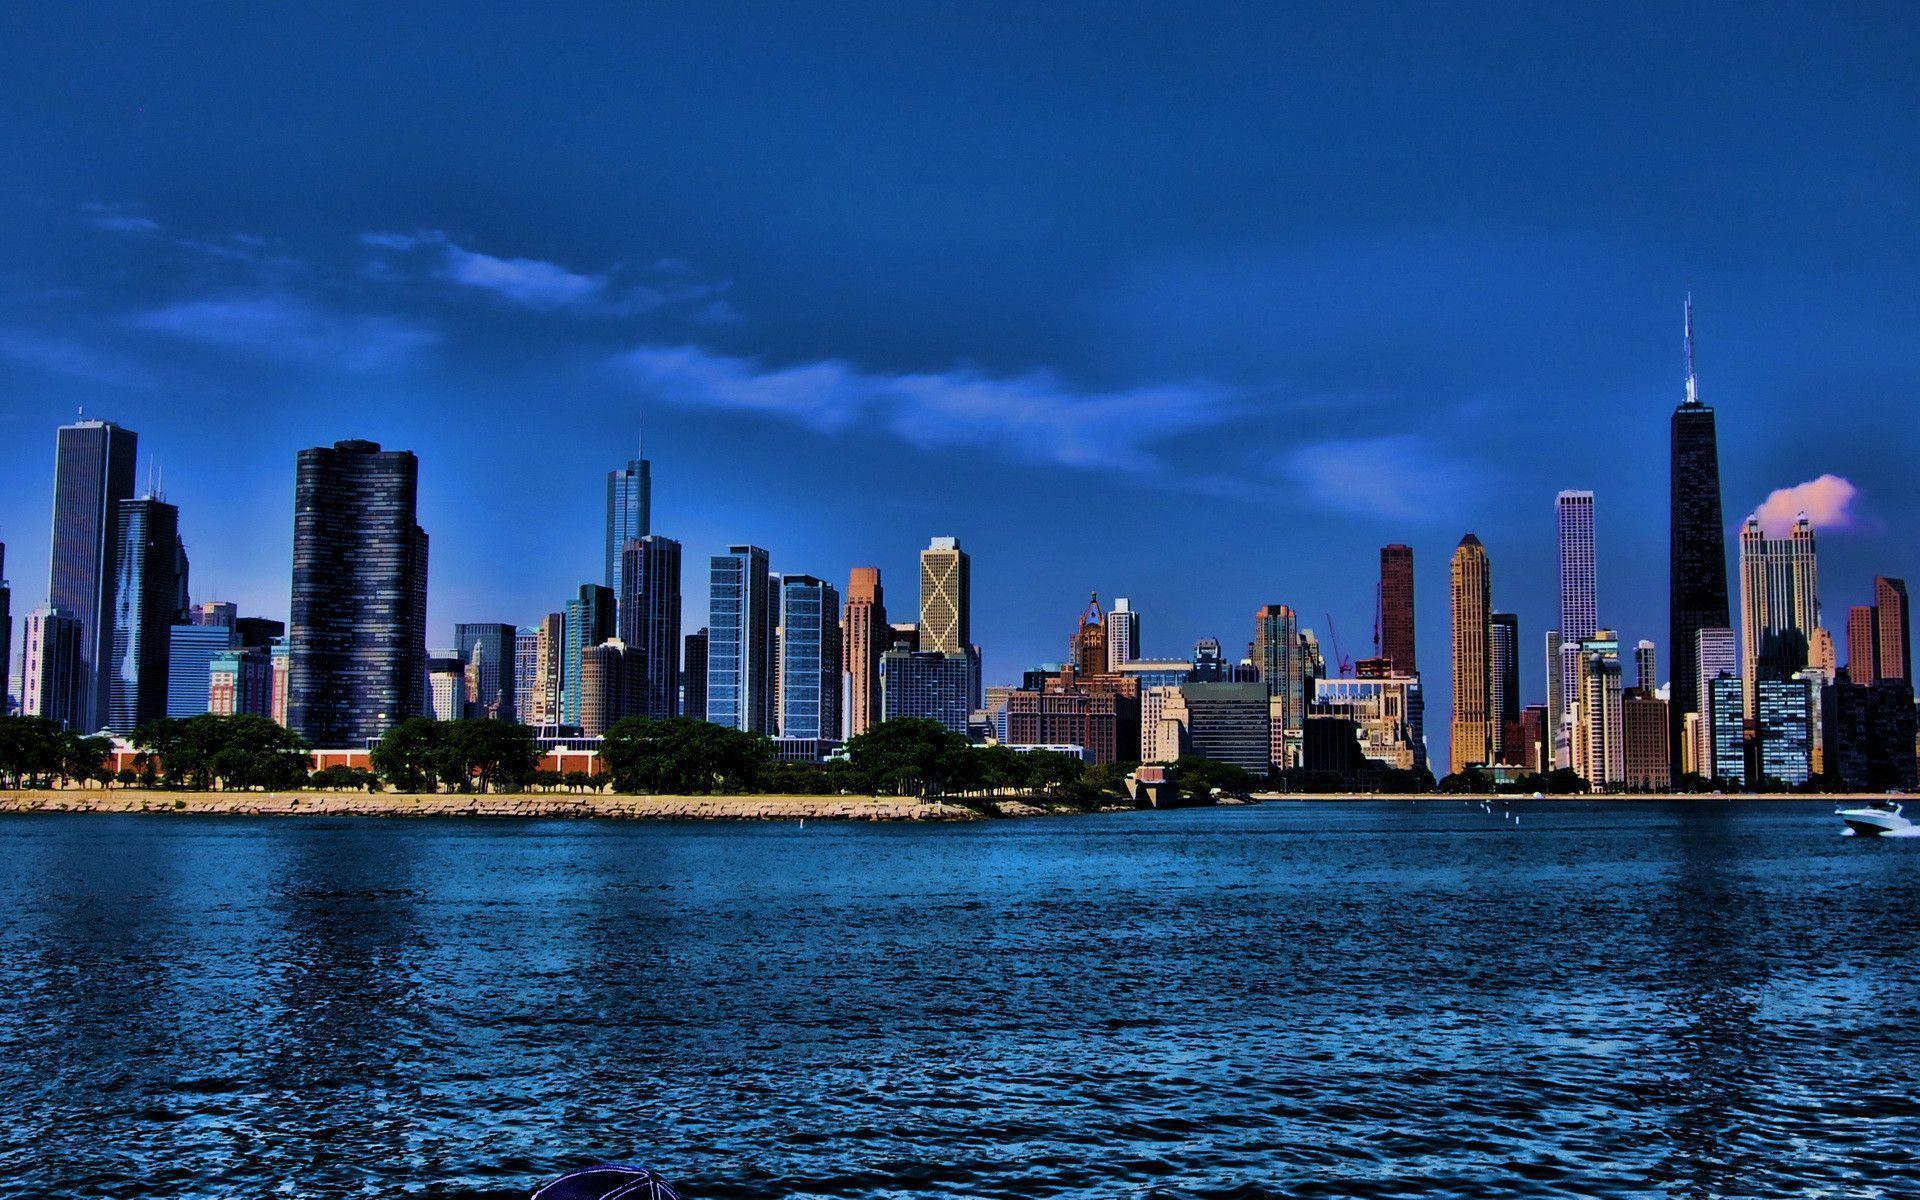 Chicago Computer Wallpapers, Desktop Backgrounds 1920x1200 Id: 429276